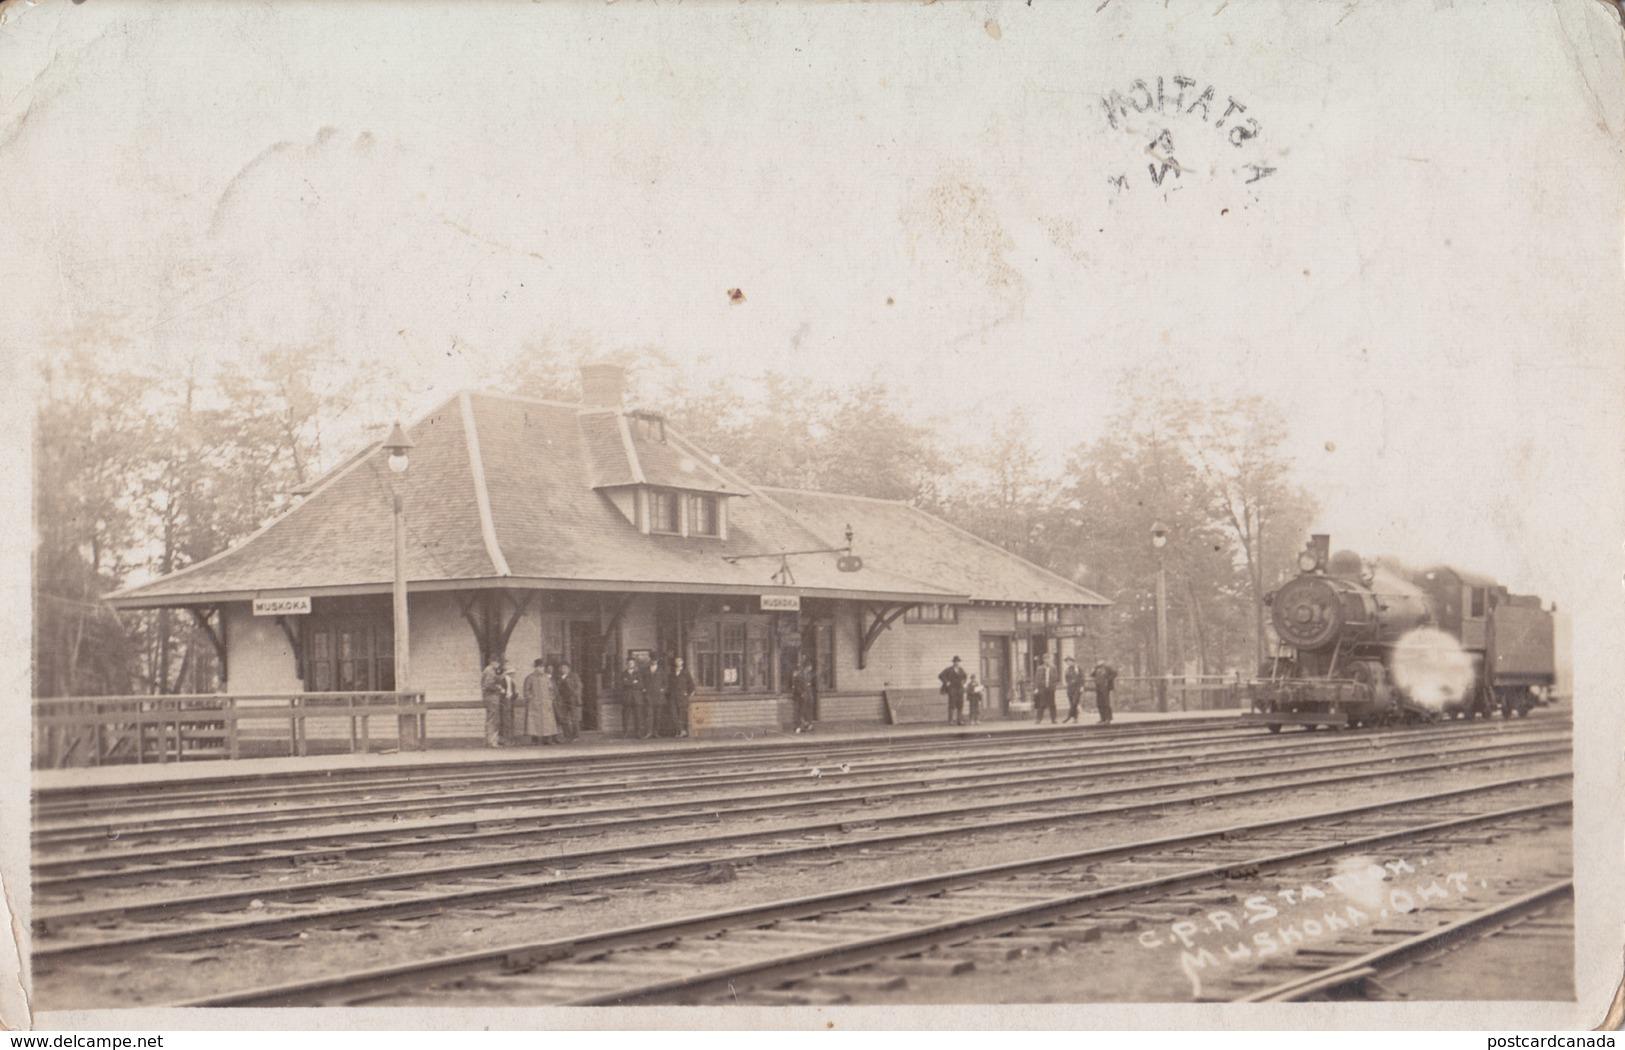 RPPC REAL PHOTO POSTCARD MUSKOKA ONTARIO TRAIN STATION RAILWAY DEPOT 1913 - Gares - Avec Trains